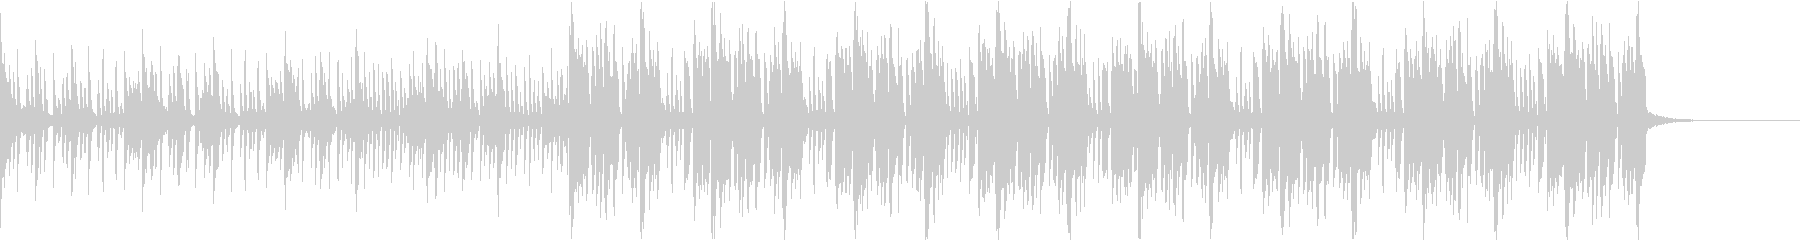 Pf「謀」和風現代ジャズの未再生の波形